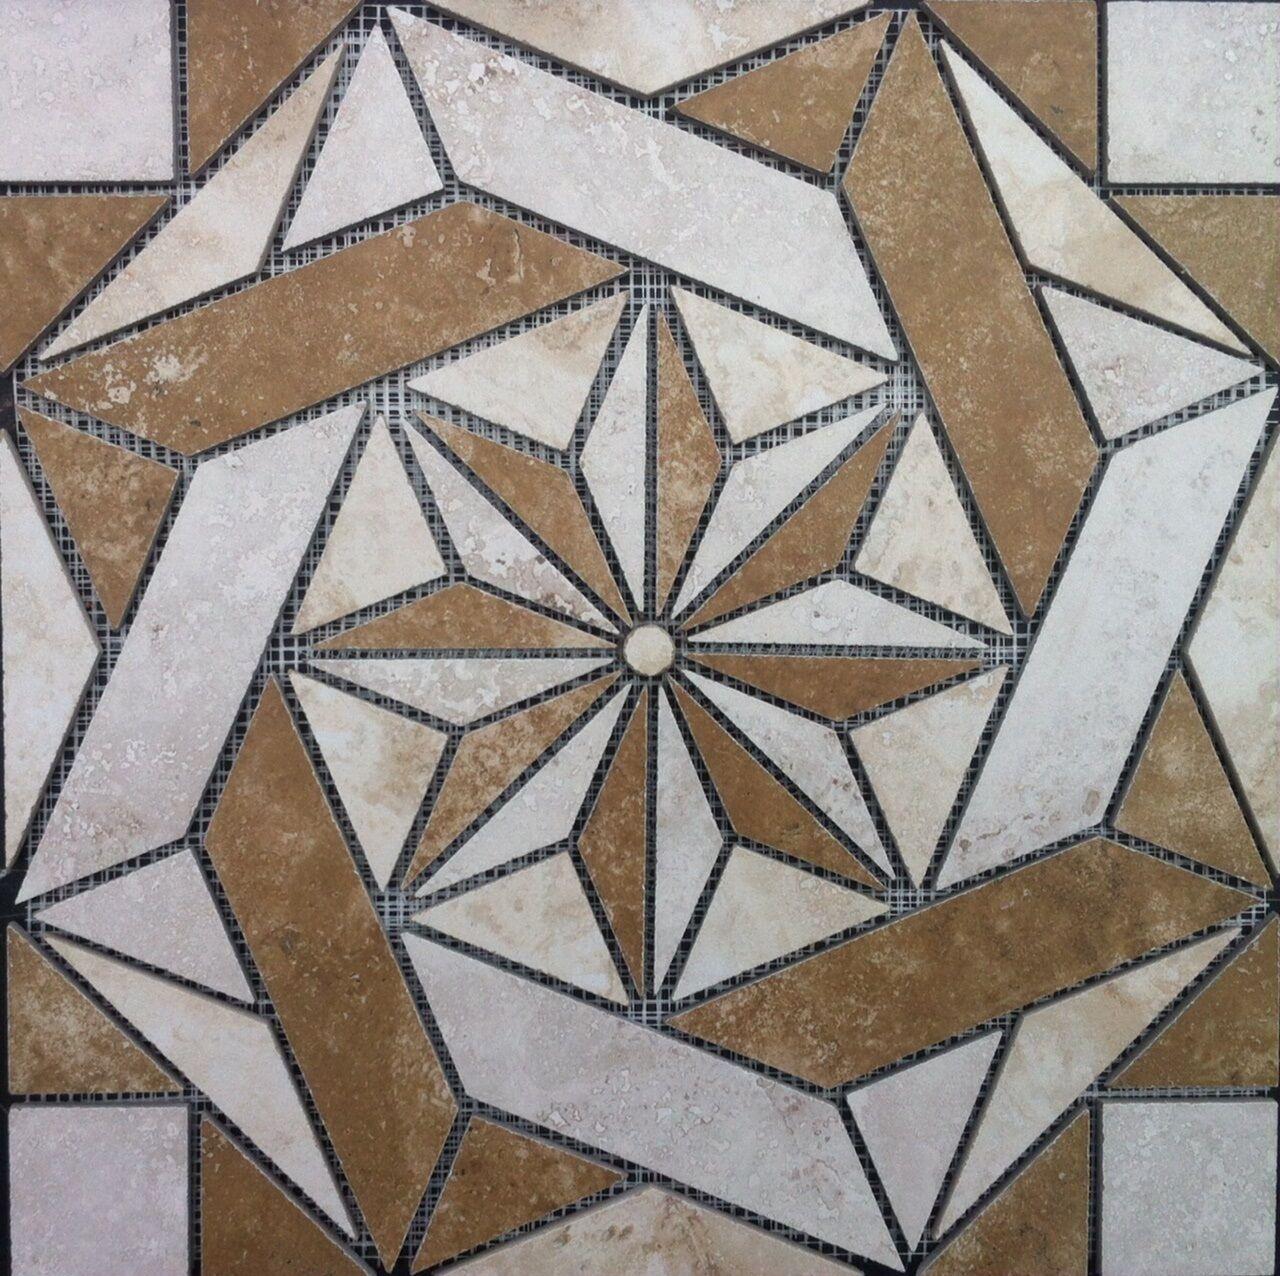 16 3 8  Tile Medallion - Daltile's Esta Villa series